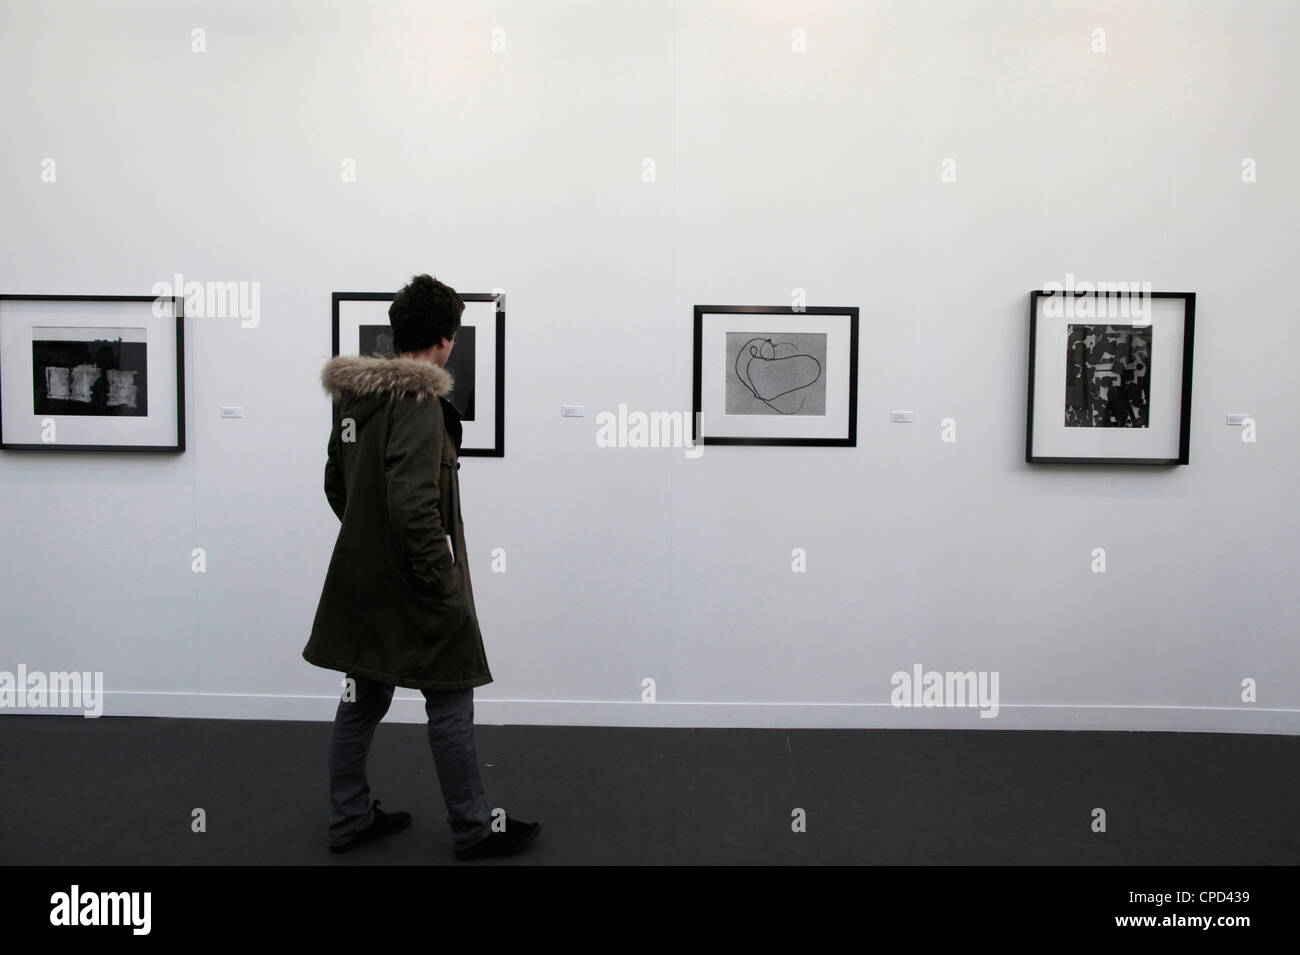 Paris Foto zeigen, Paris, Frankreich, Europa Stockbild